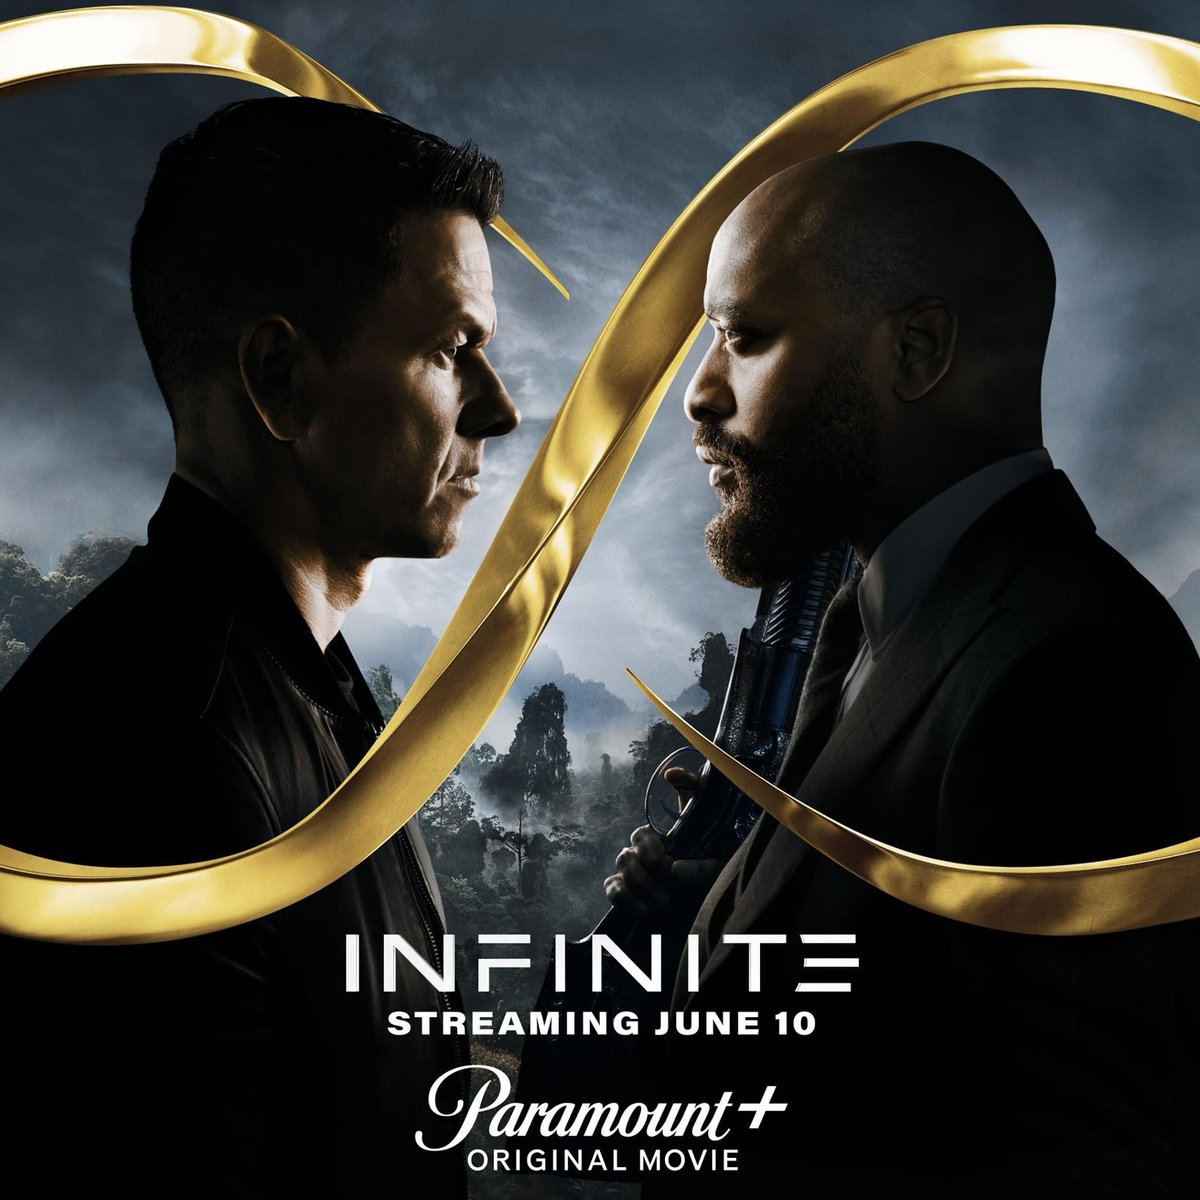 Infinite movie